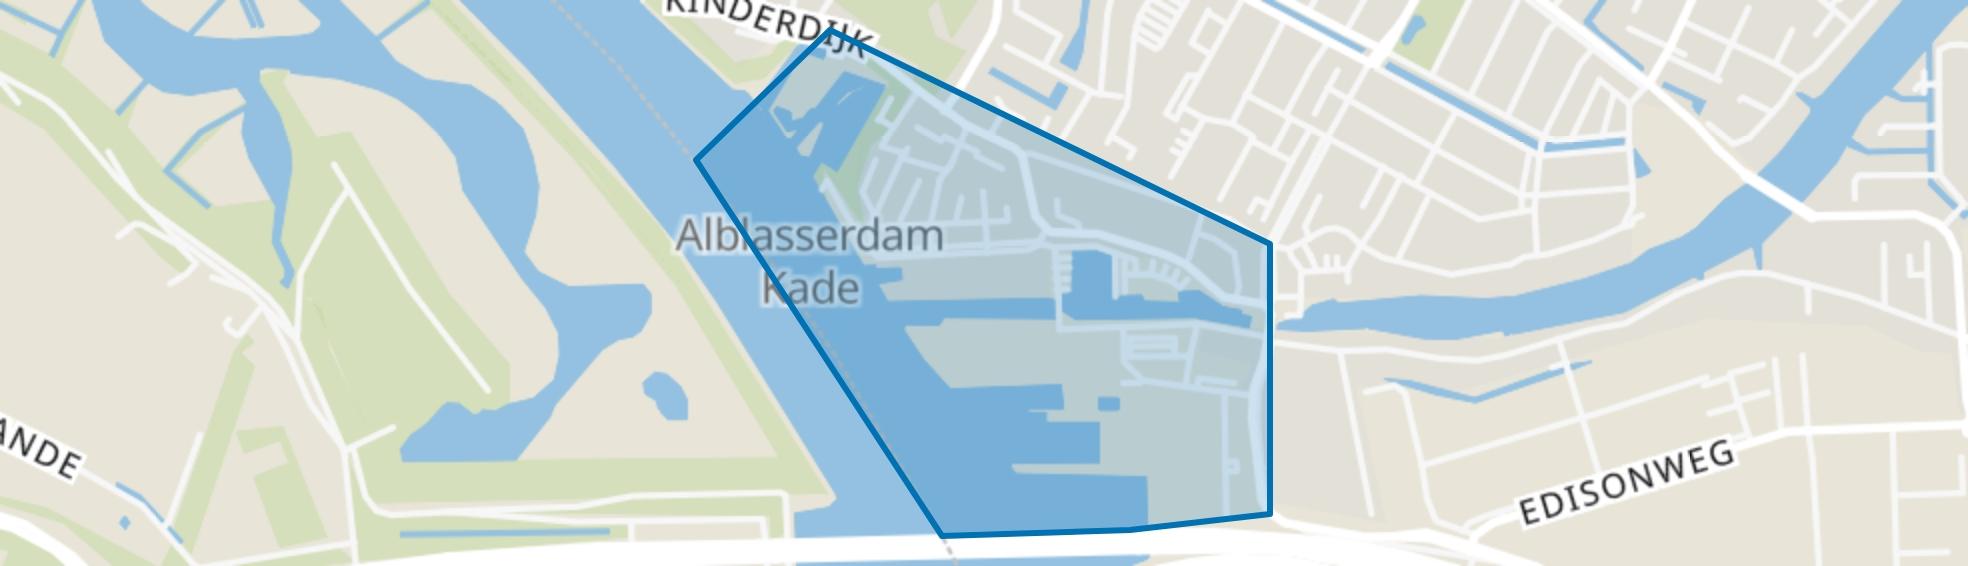 De Werven, Alblasserdam map